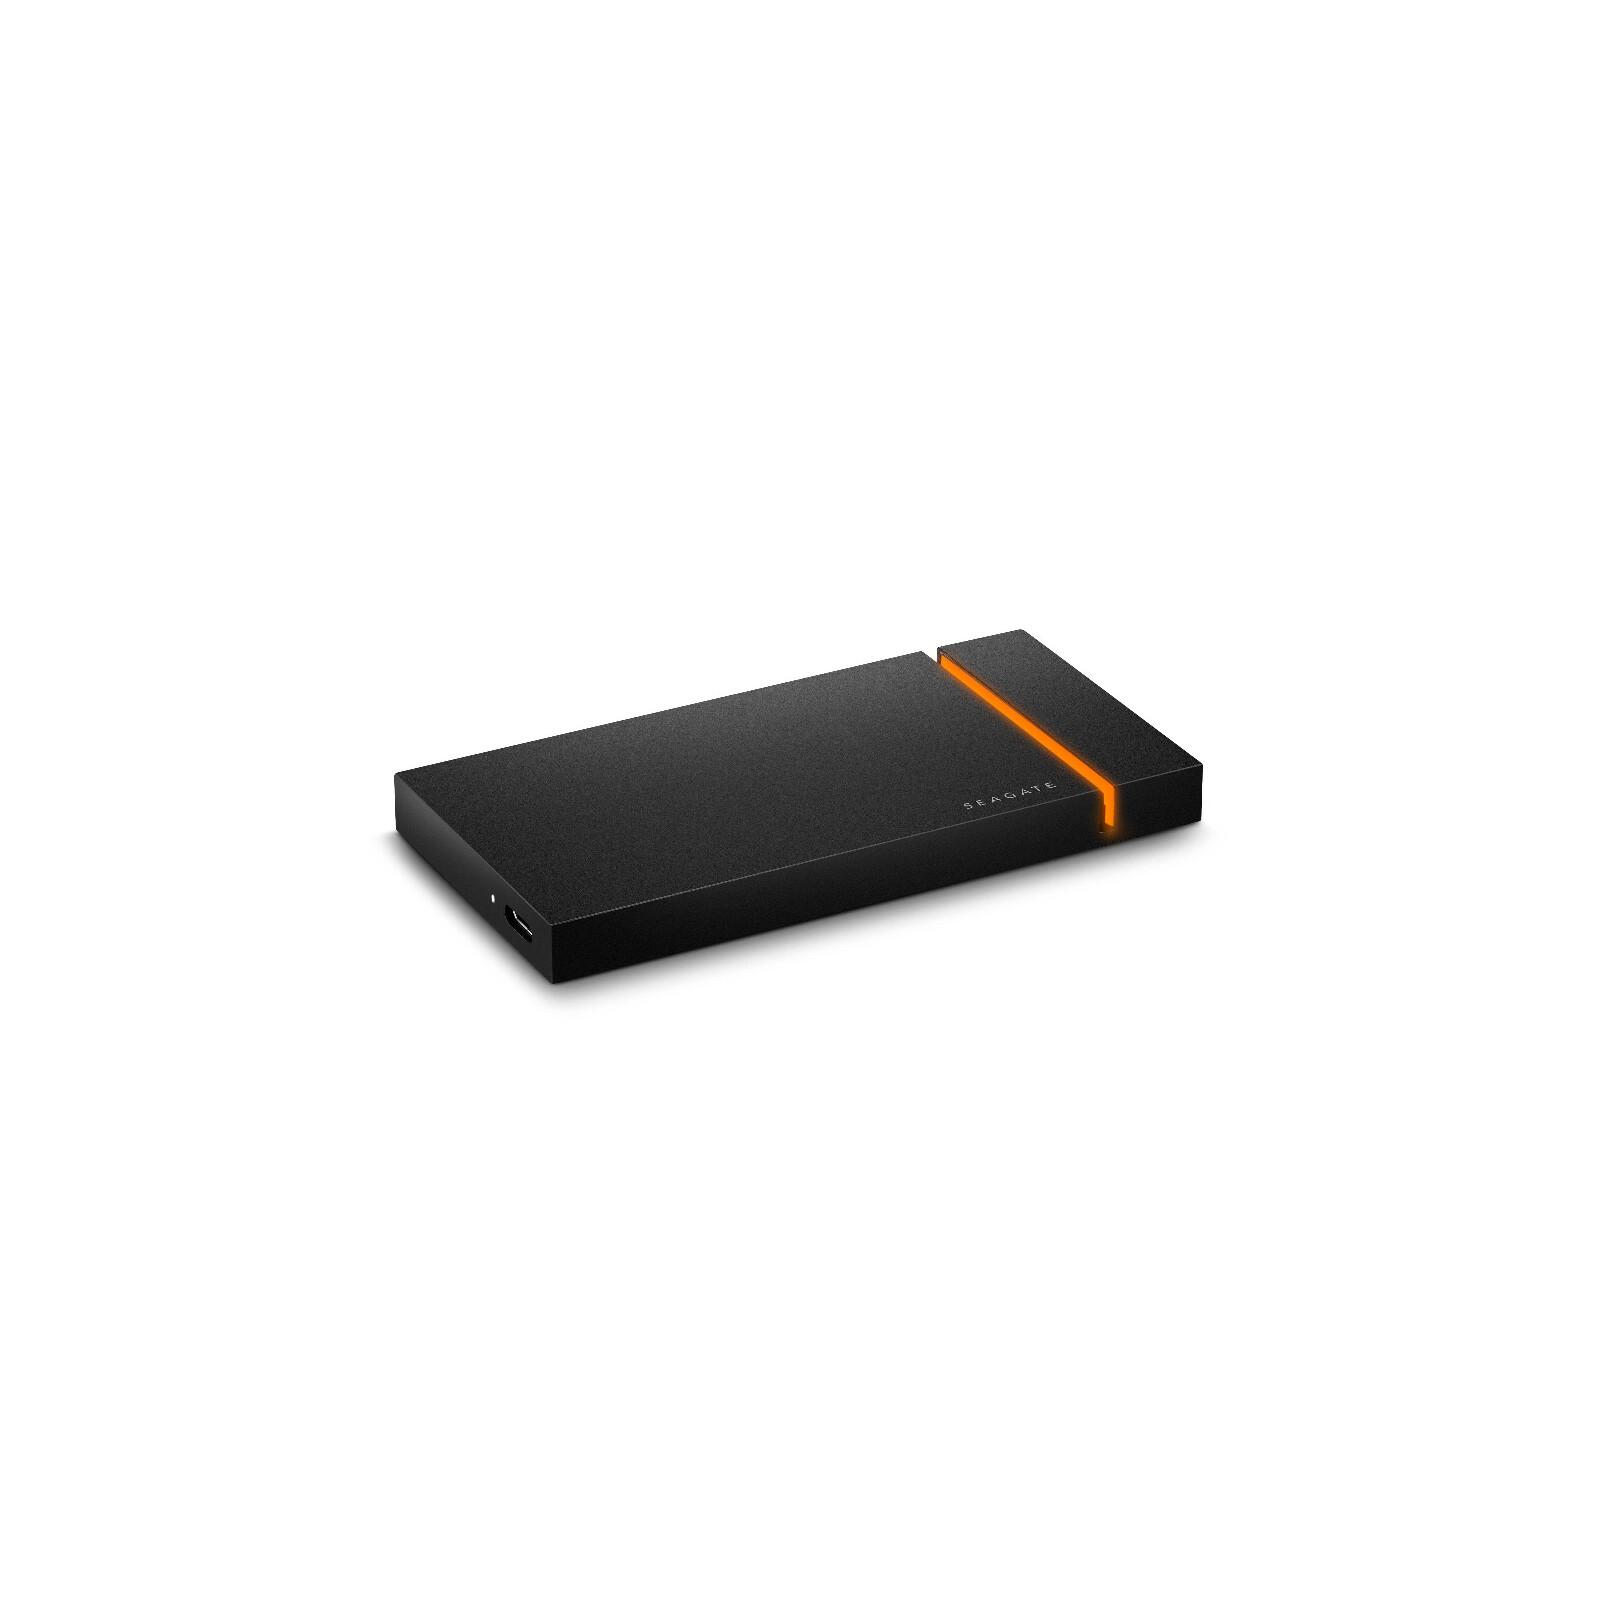 Seagate FireCuda Gaming SSD 2TB extern, NVMe, USB 3.2 gen2x2